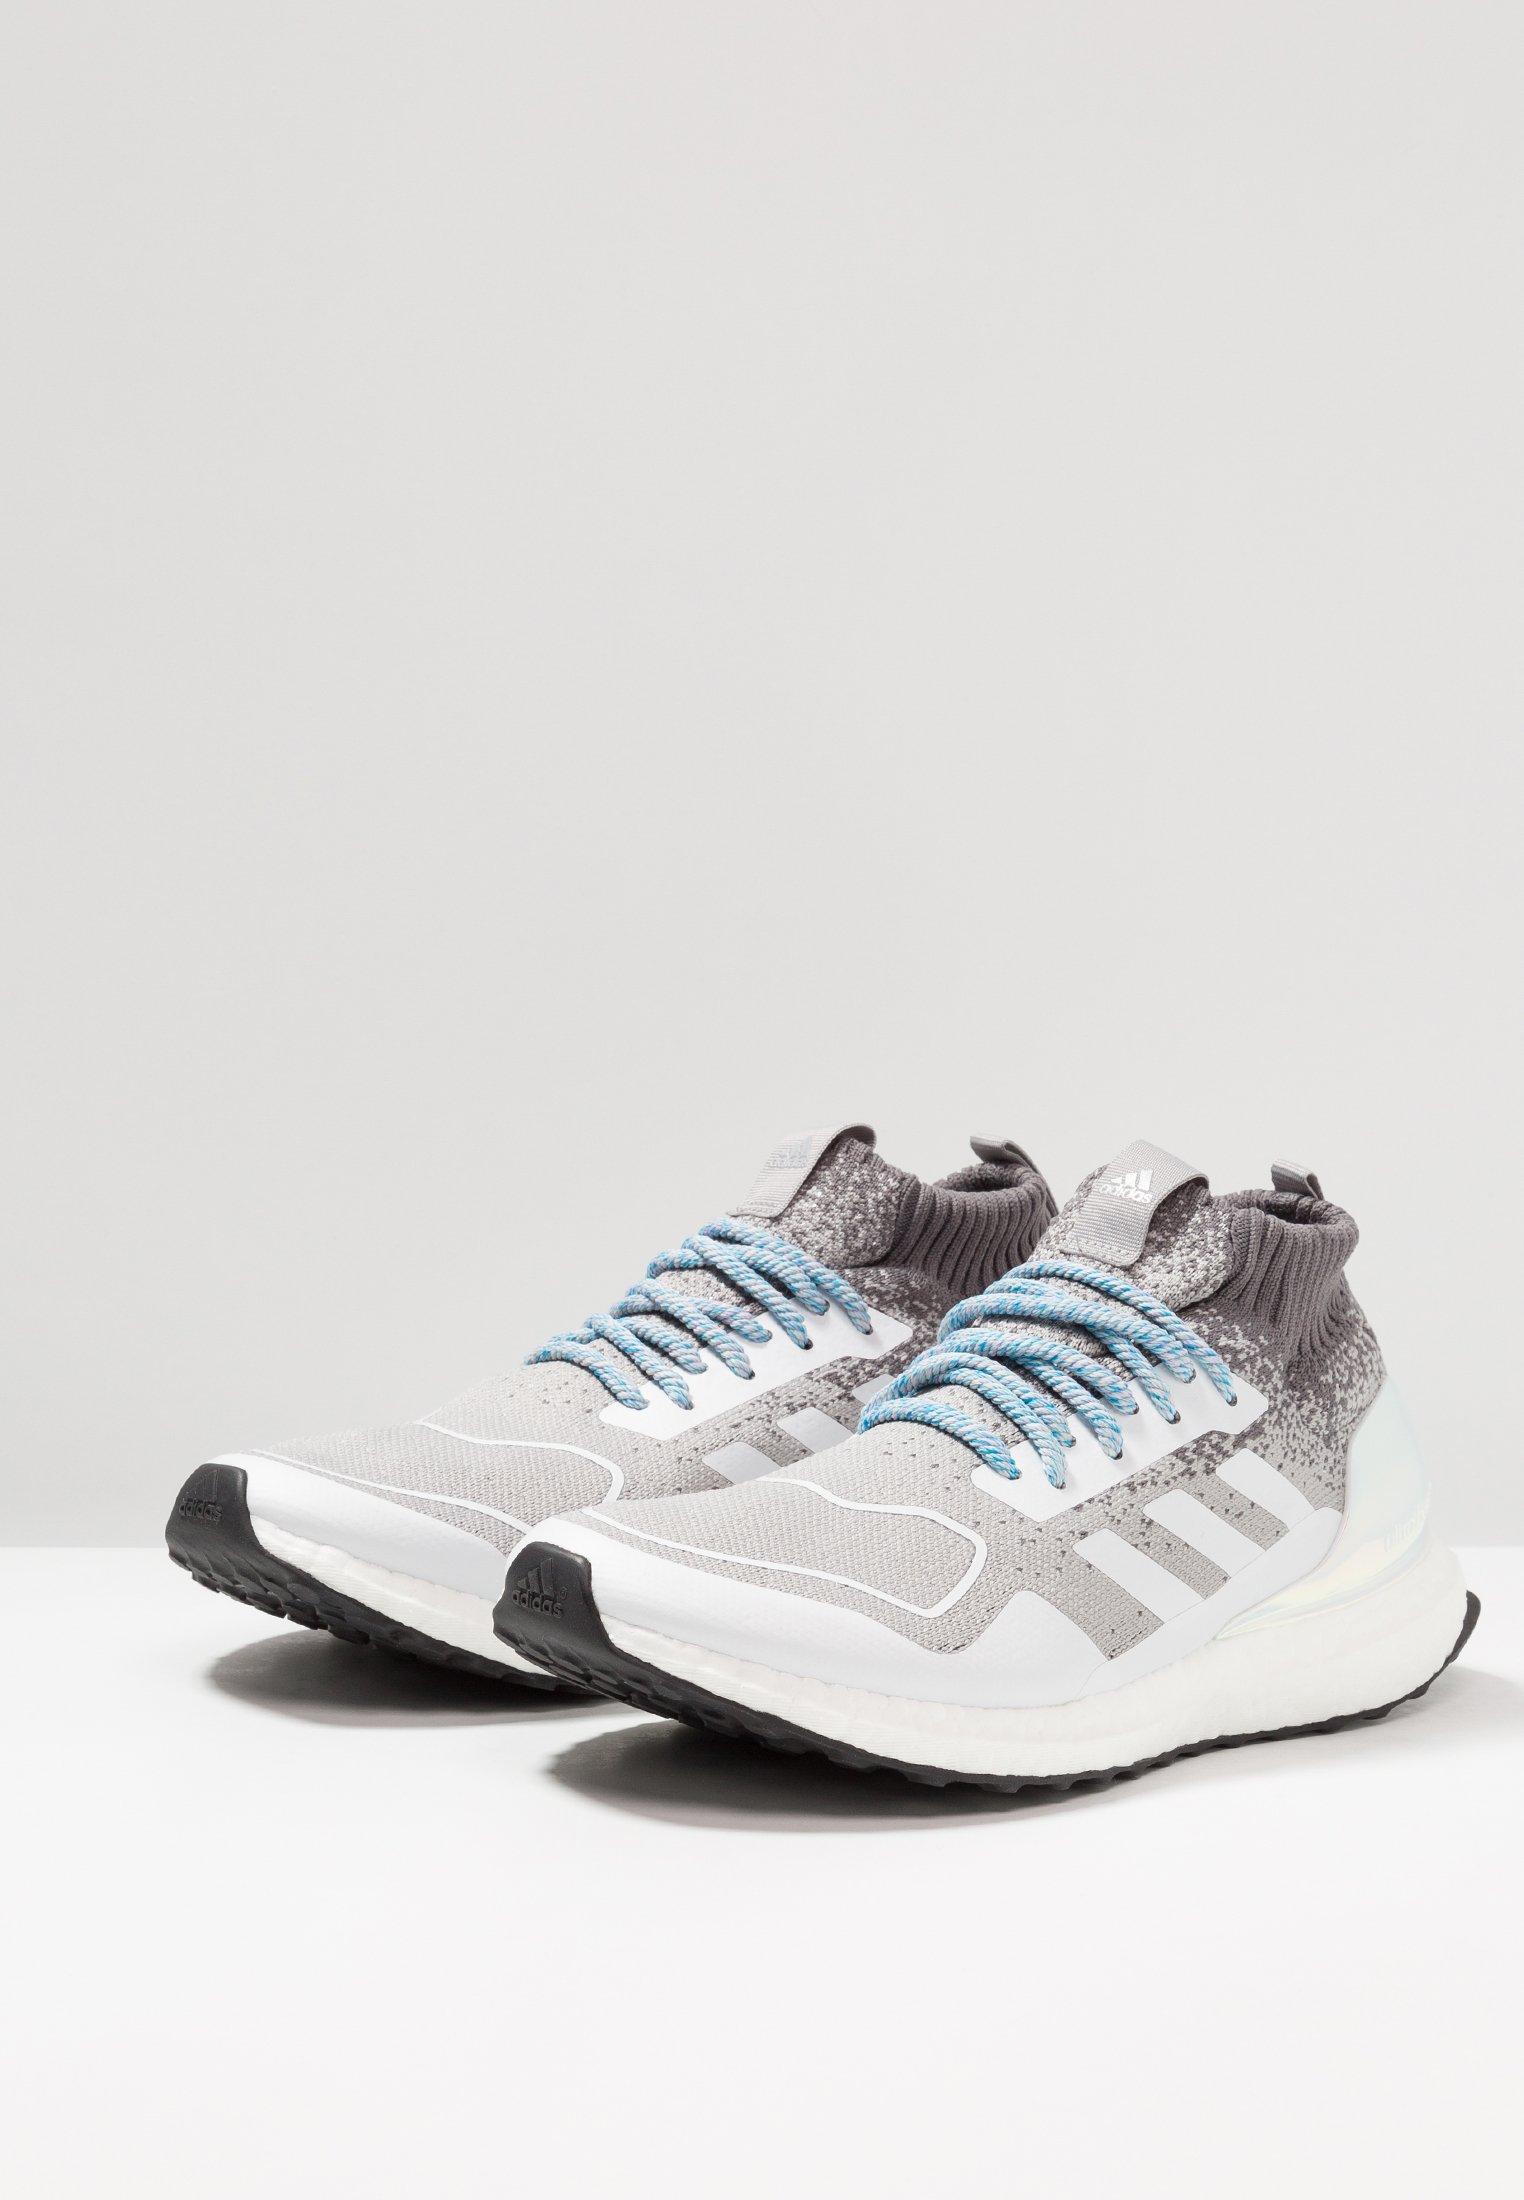 adidas Performance ULTRABOOST MID CHRISMAS CAROL - Chaussures de running neutres light granite/silver metallic